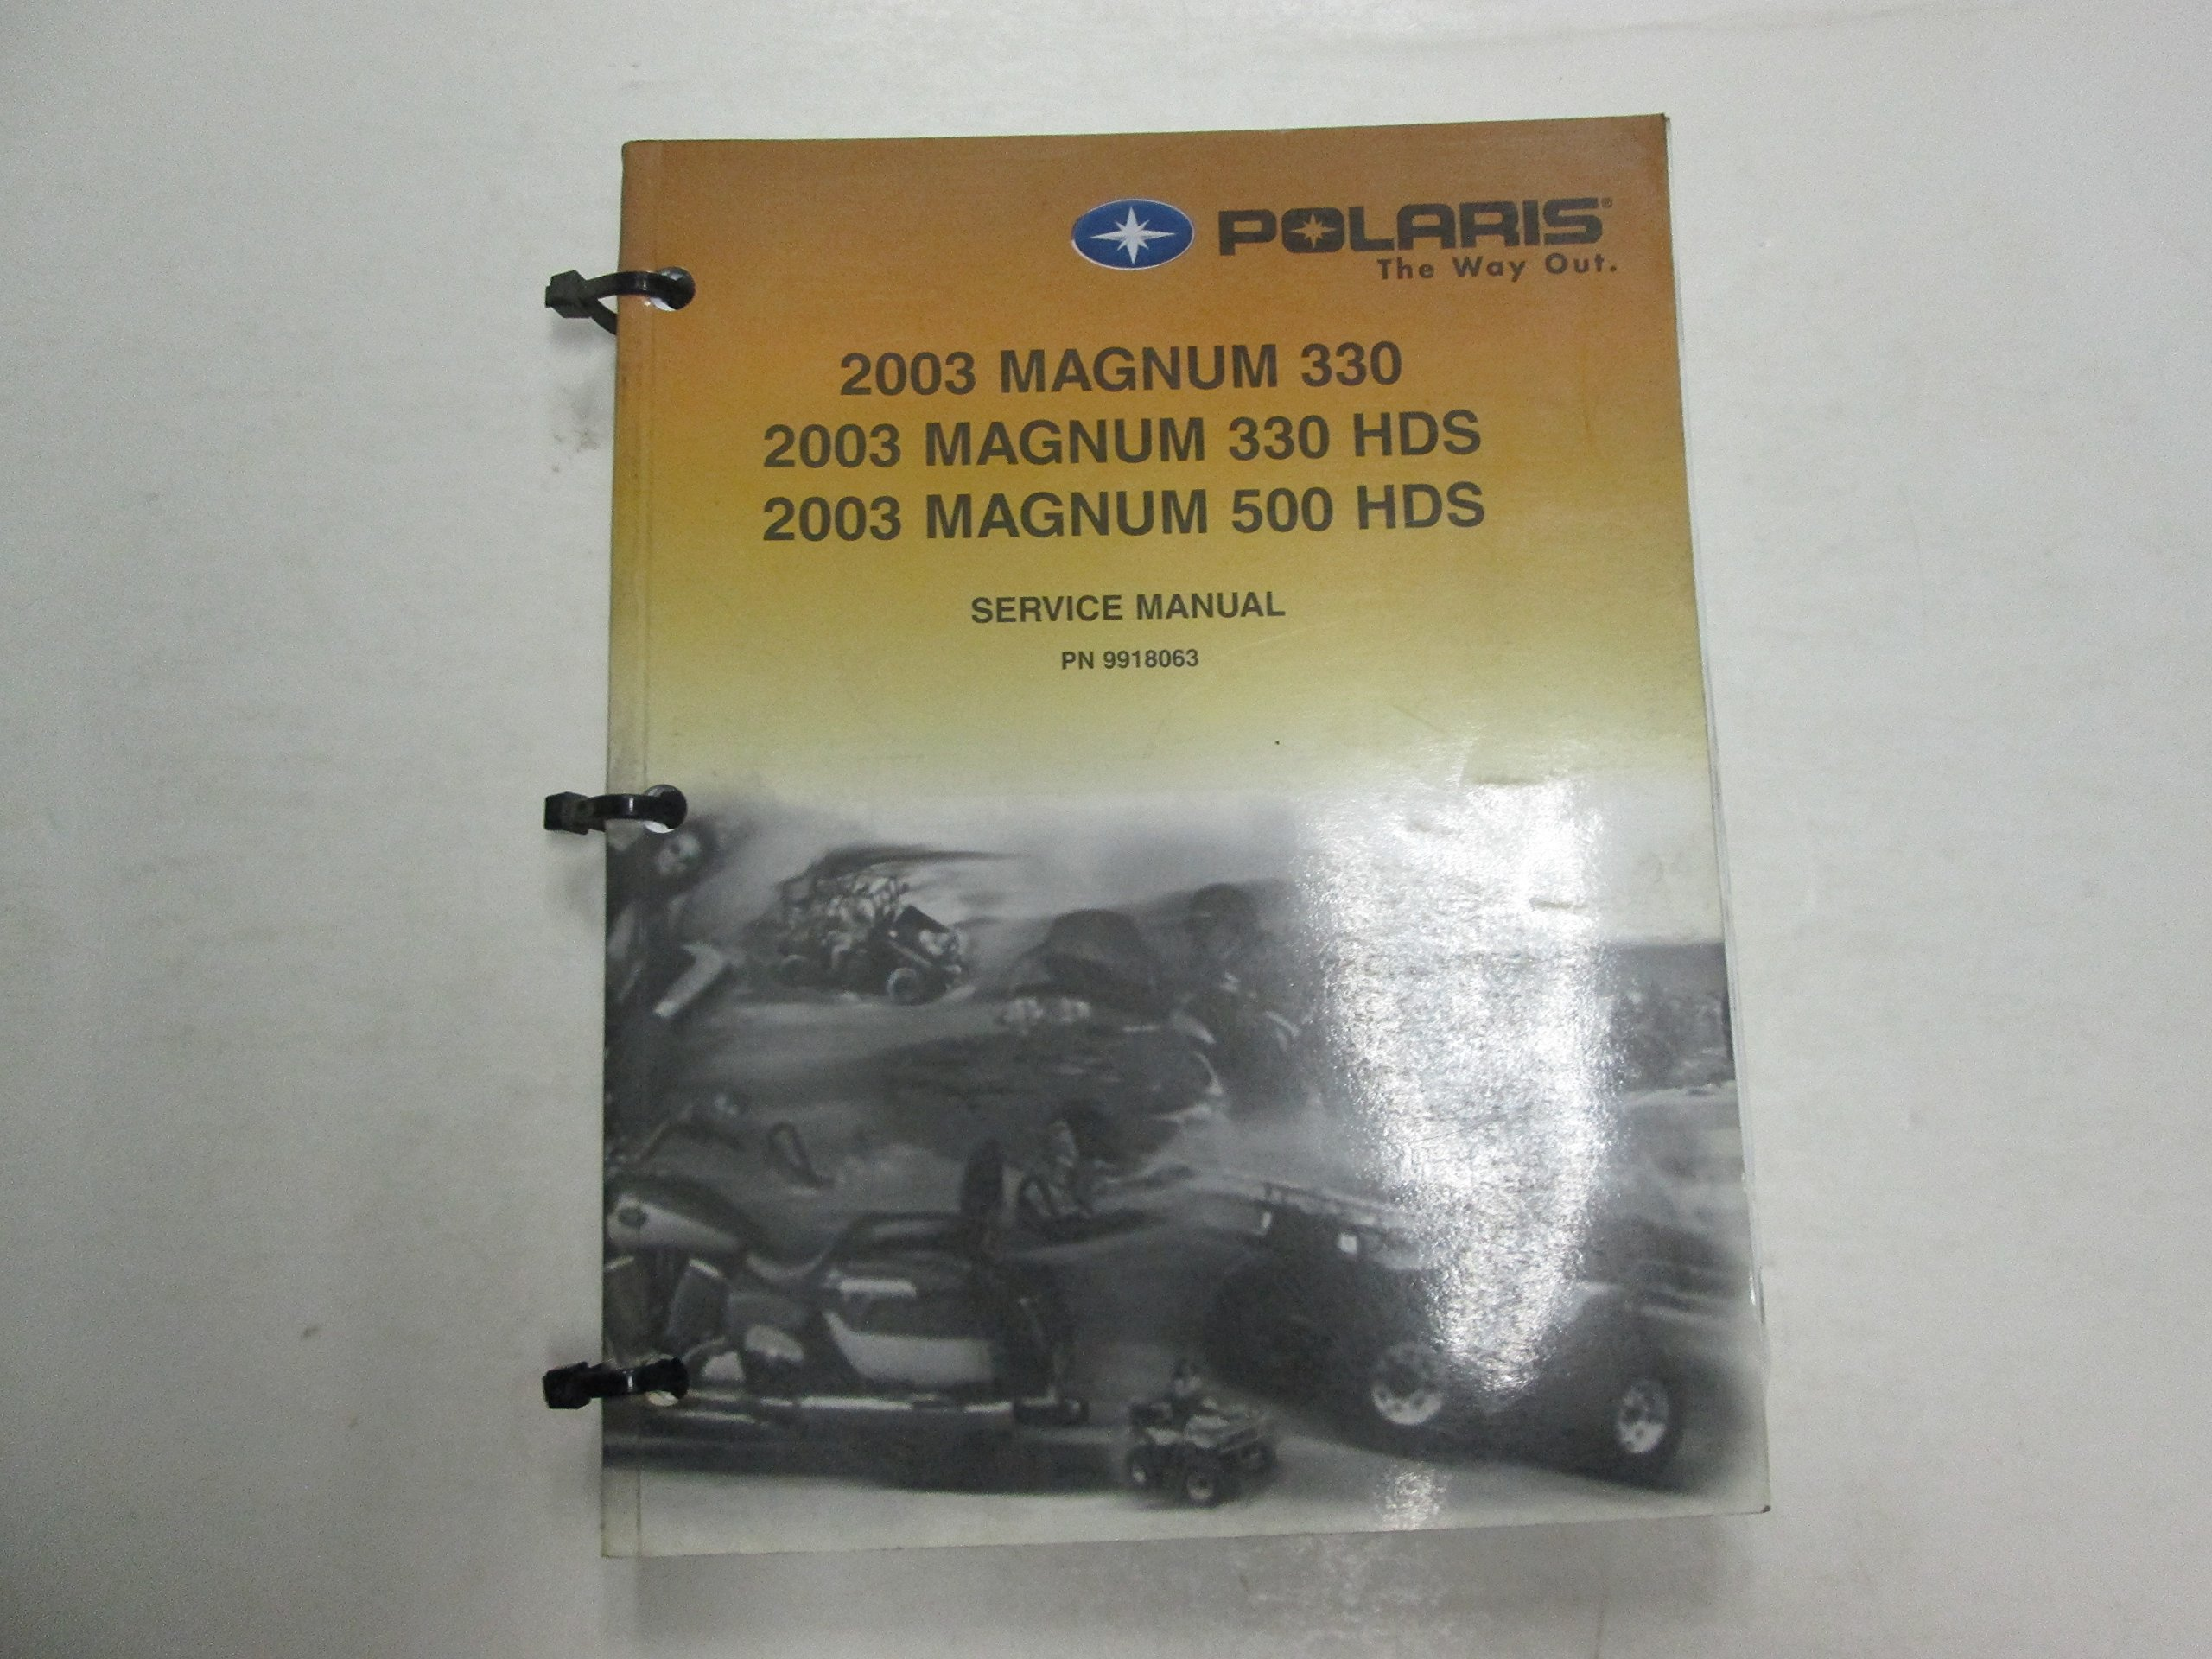 2003 polaris magnum 330 hds 500 hds service repair manual damaged.